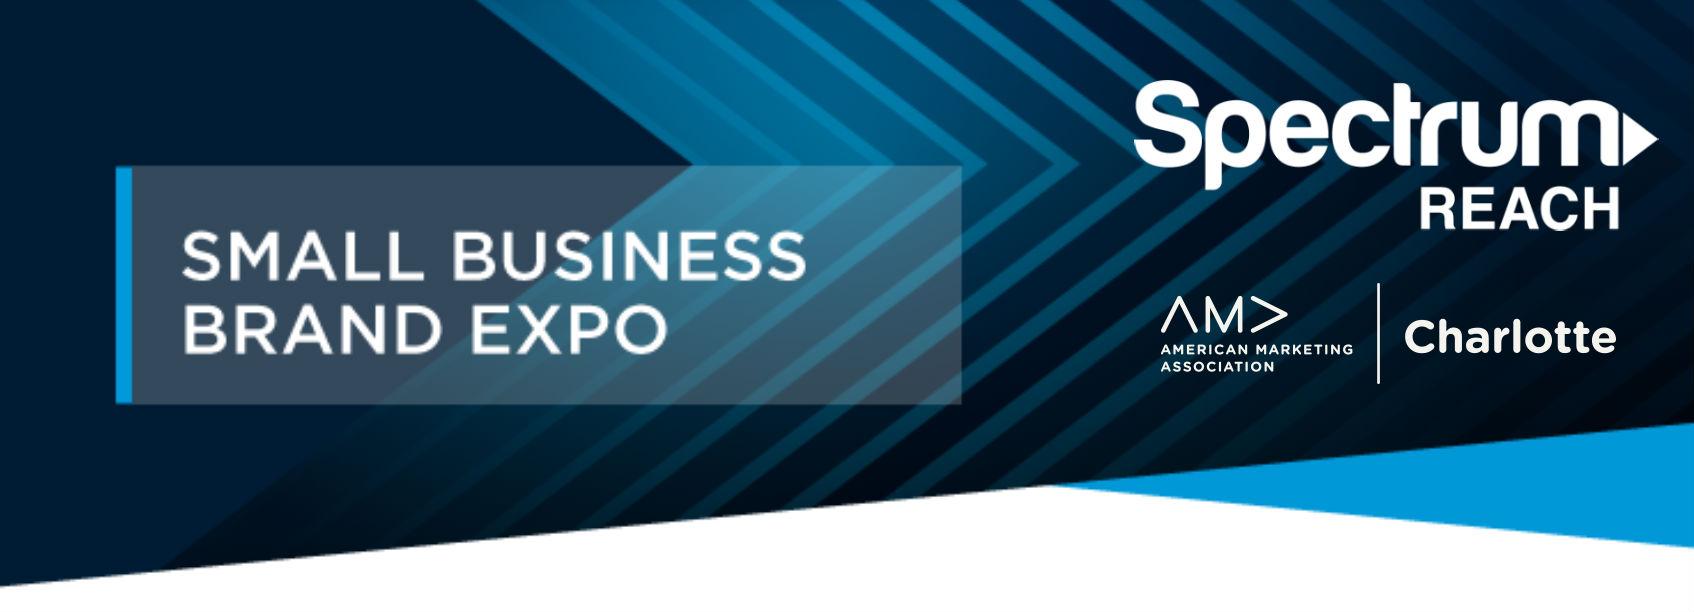 Small Business Brand Expo-Spectrum  Bannerv2.jpg